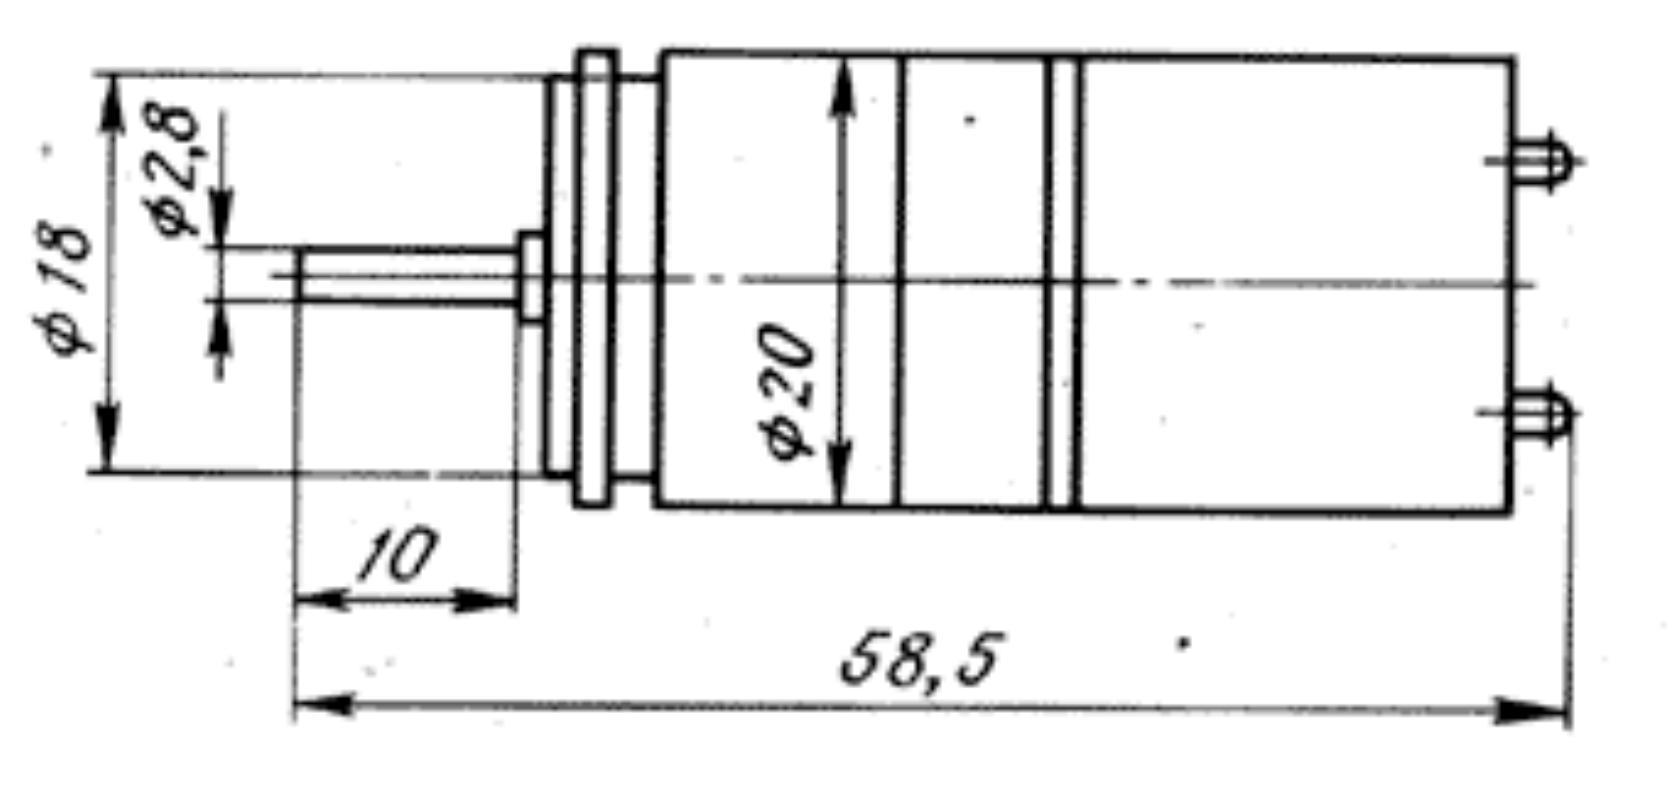 А4 выкройки формата для барби